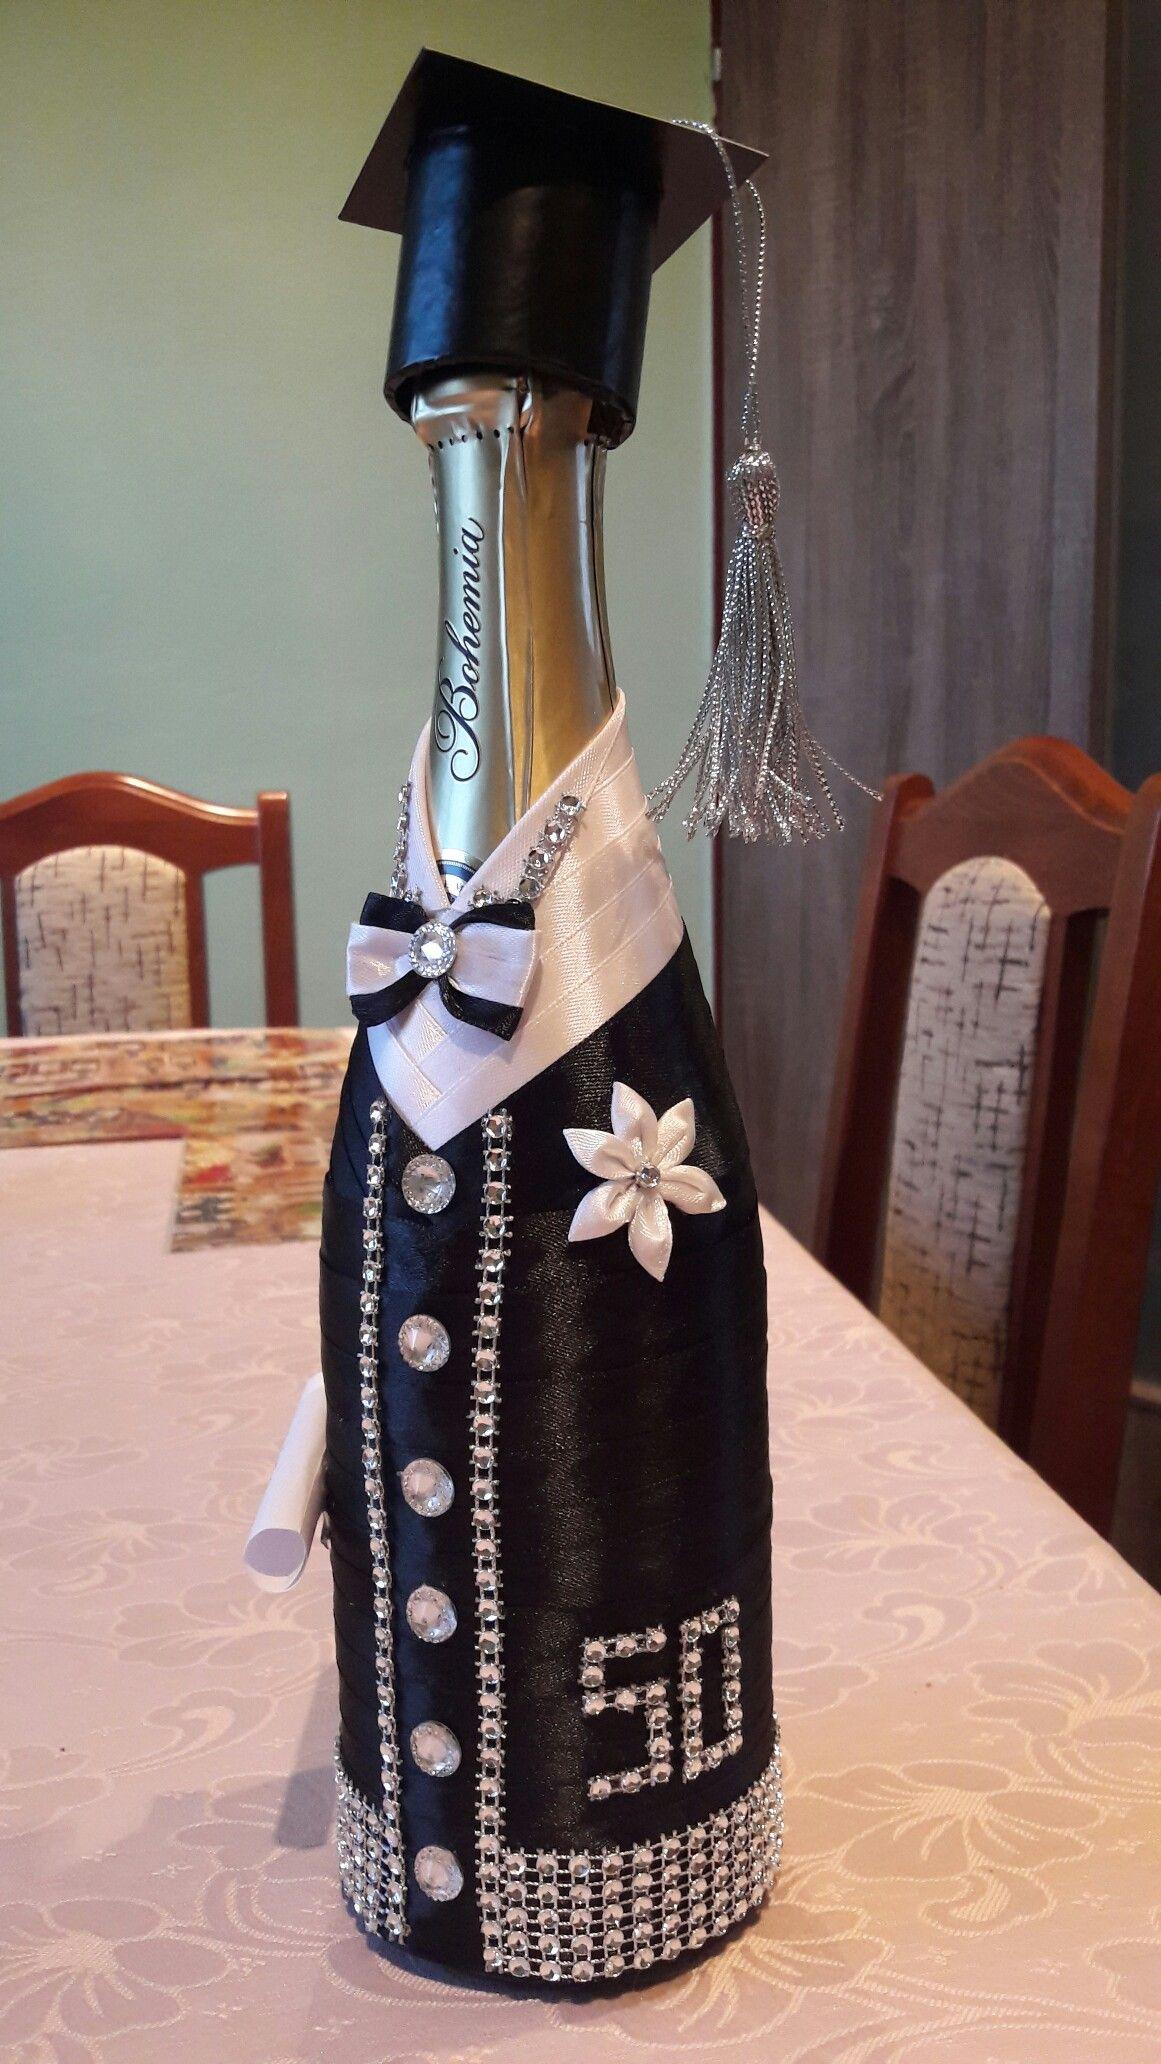 Decoratedwinebottles botellas vinos decoradas con - Botellas de vino decoradas ...